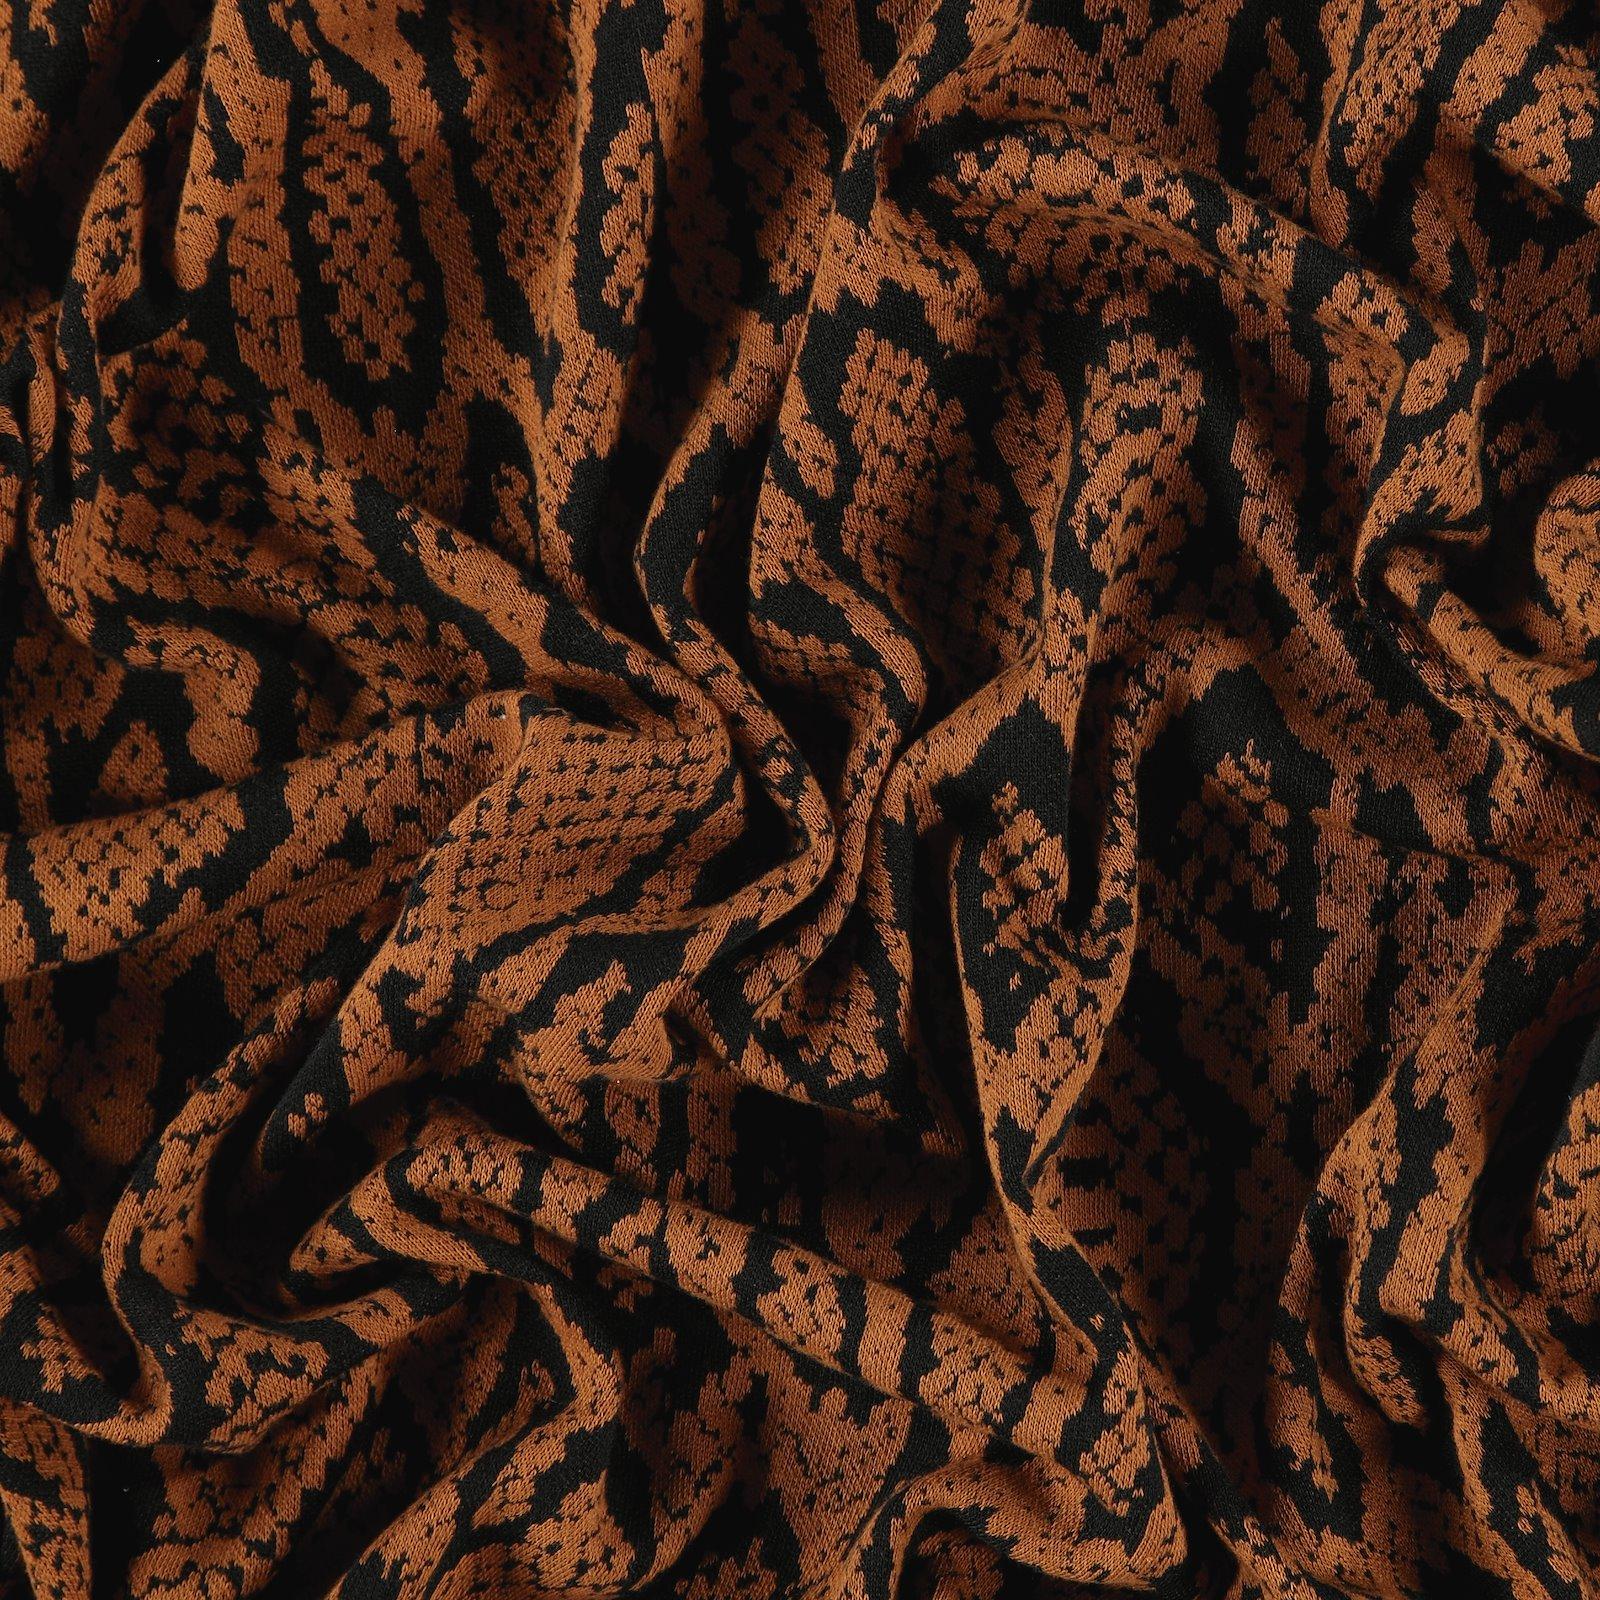 Knit jacquard caramel w snake pattern 203753_pack